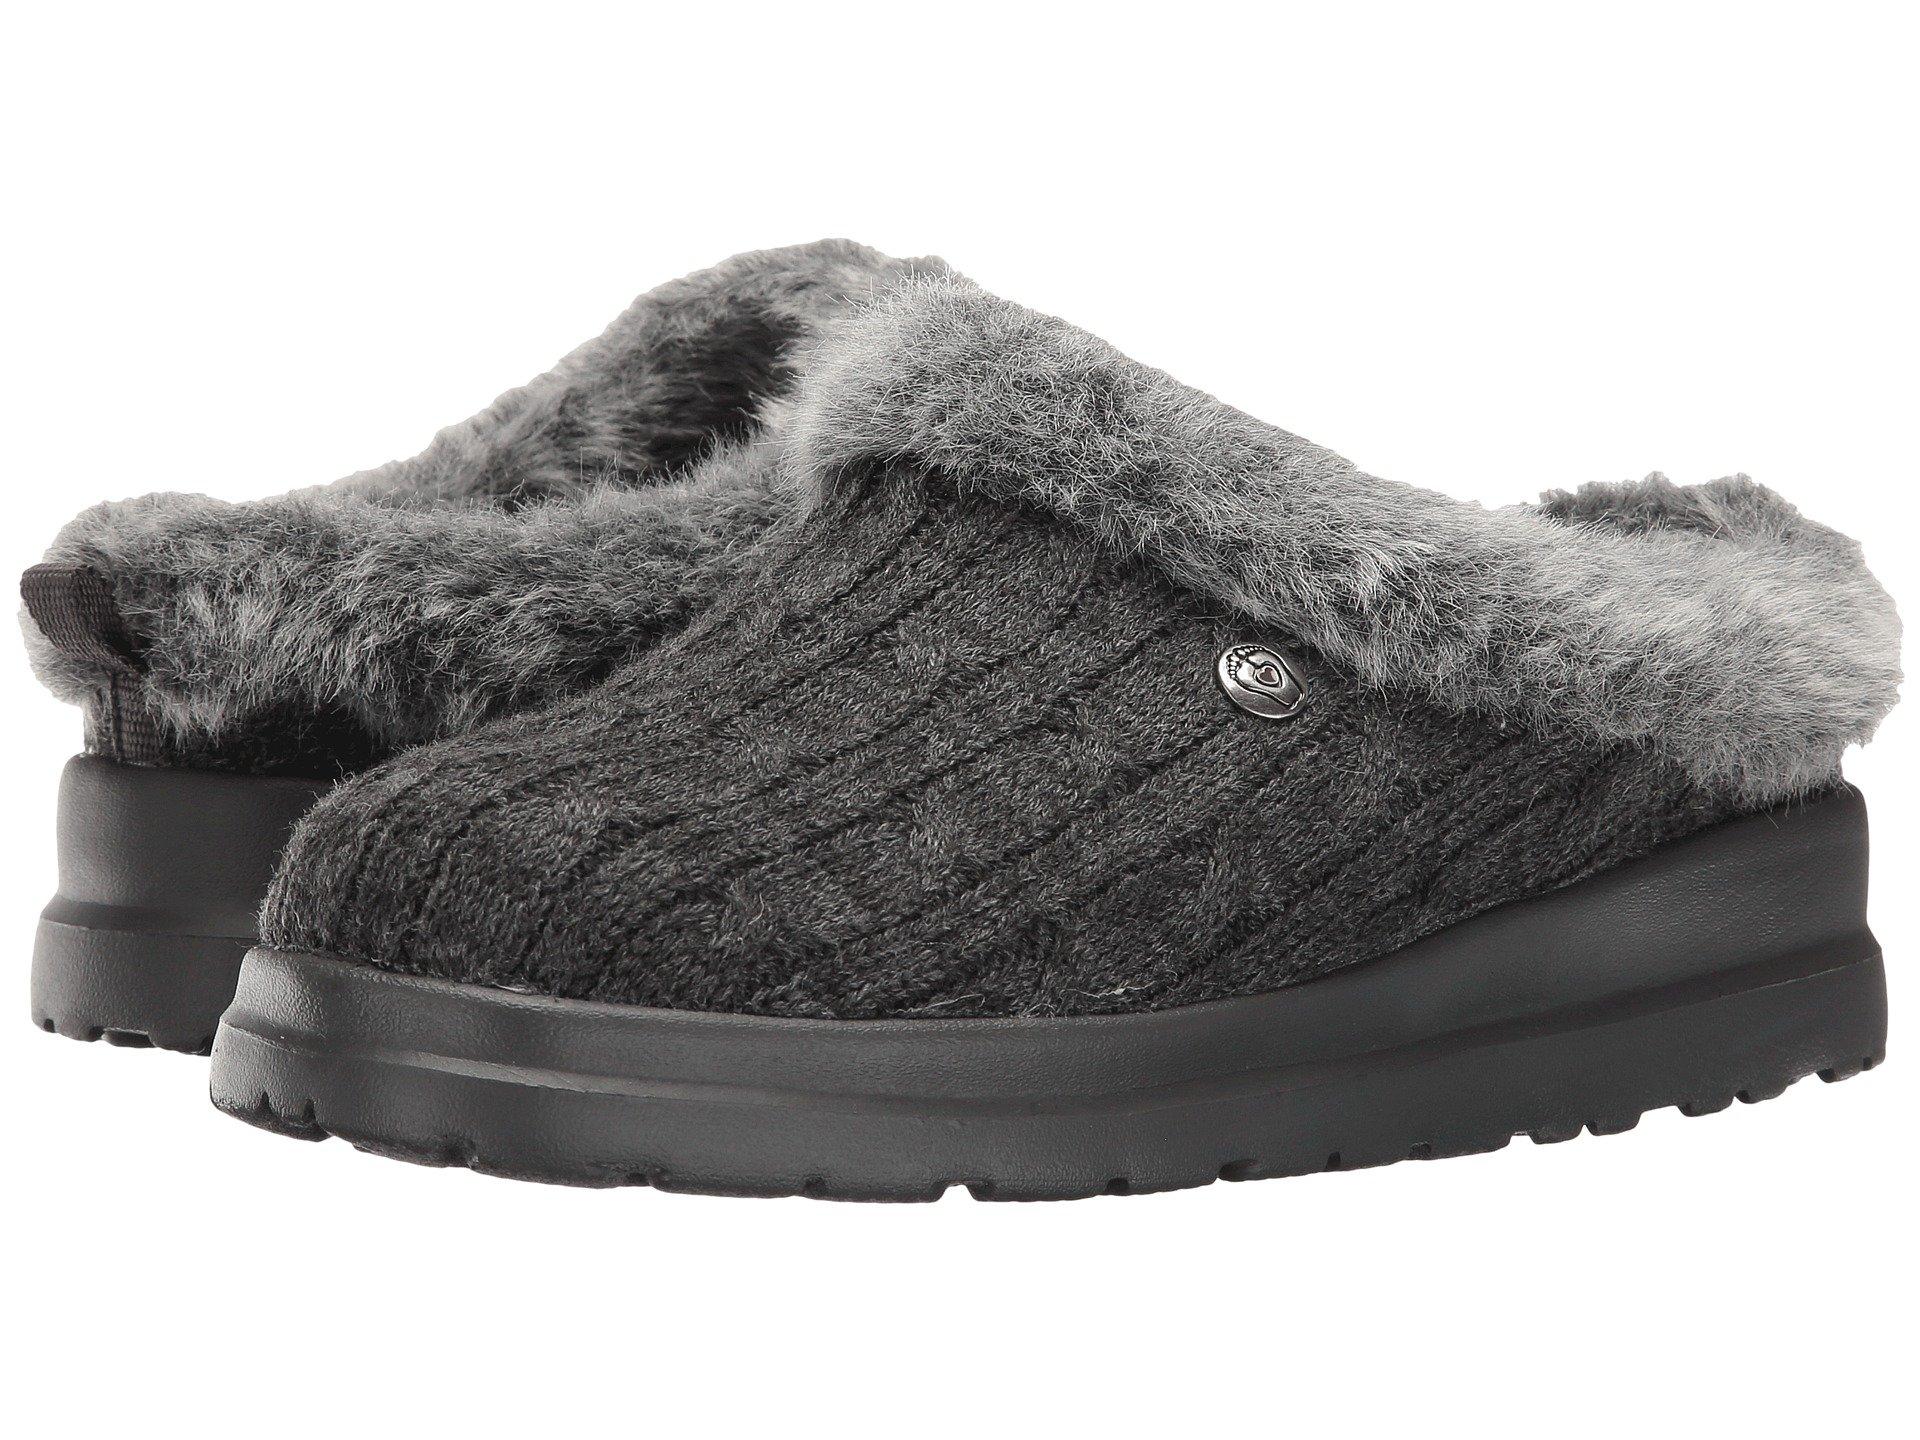 Zapato de Descanso para Mujer BOBS from SKECHERS Cherish - Bunny Hill  + SKECHERS en VeoyCompro.net